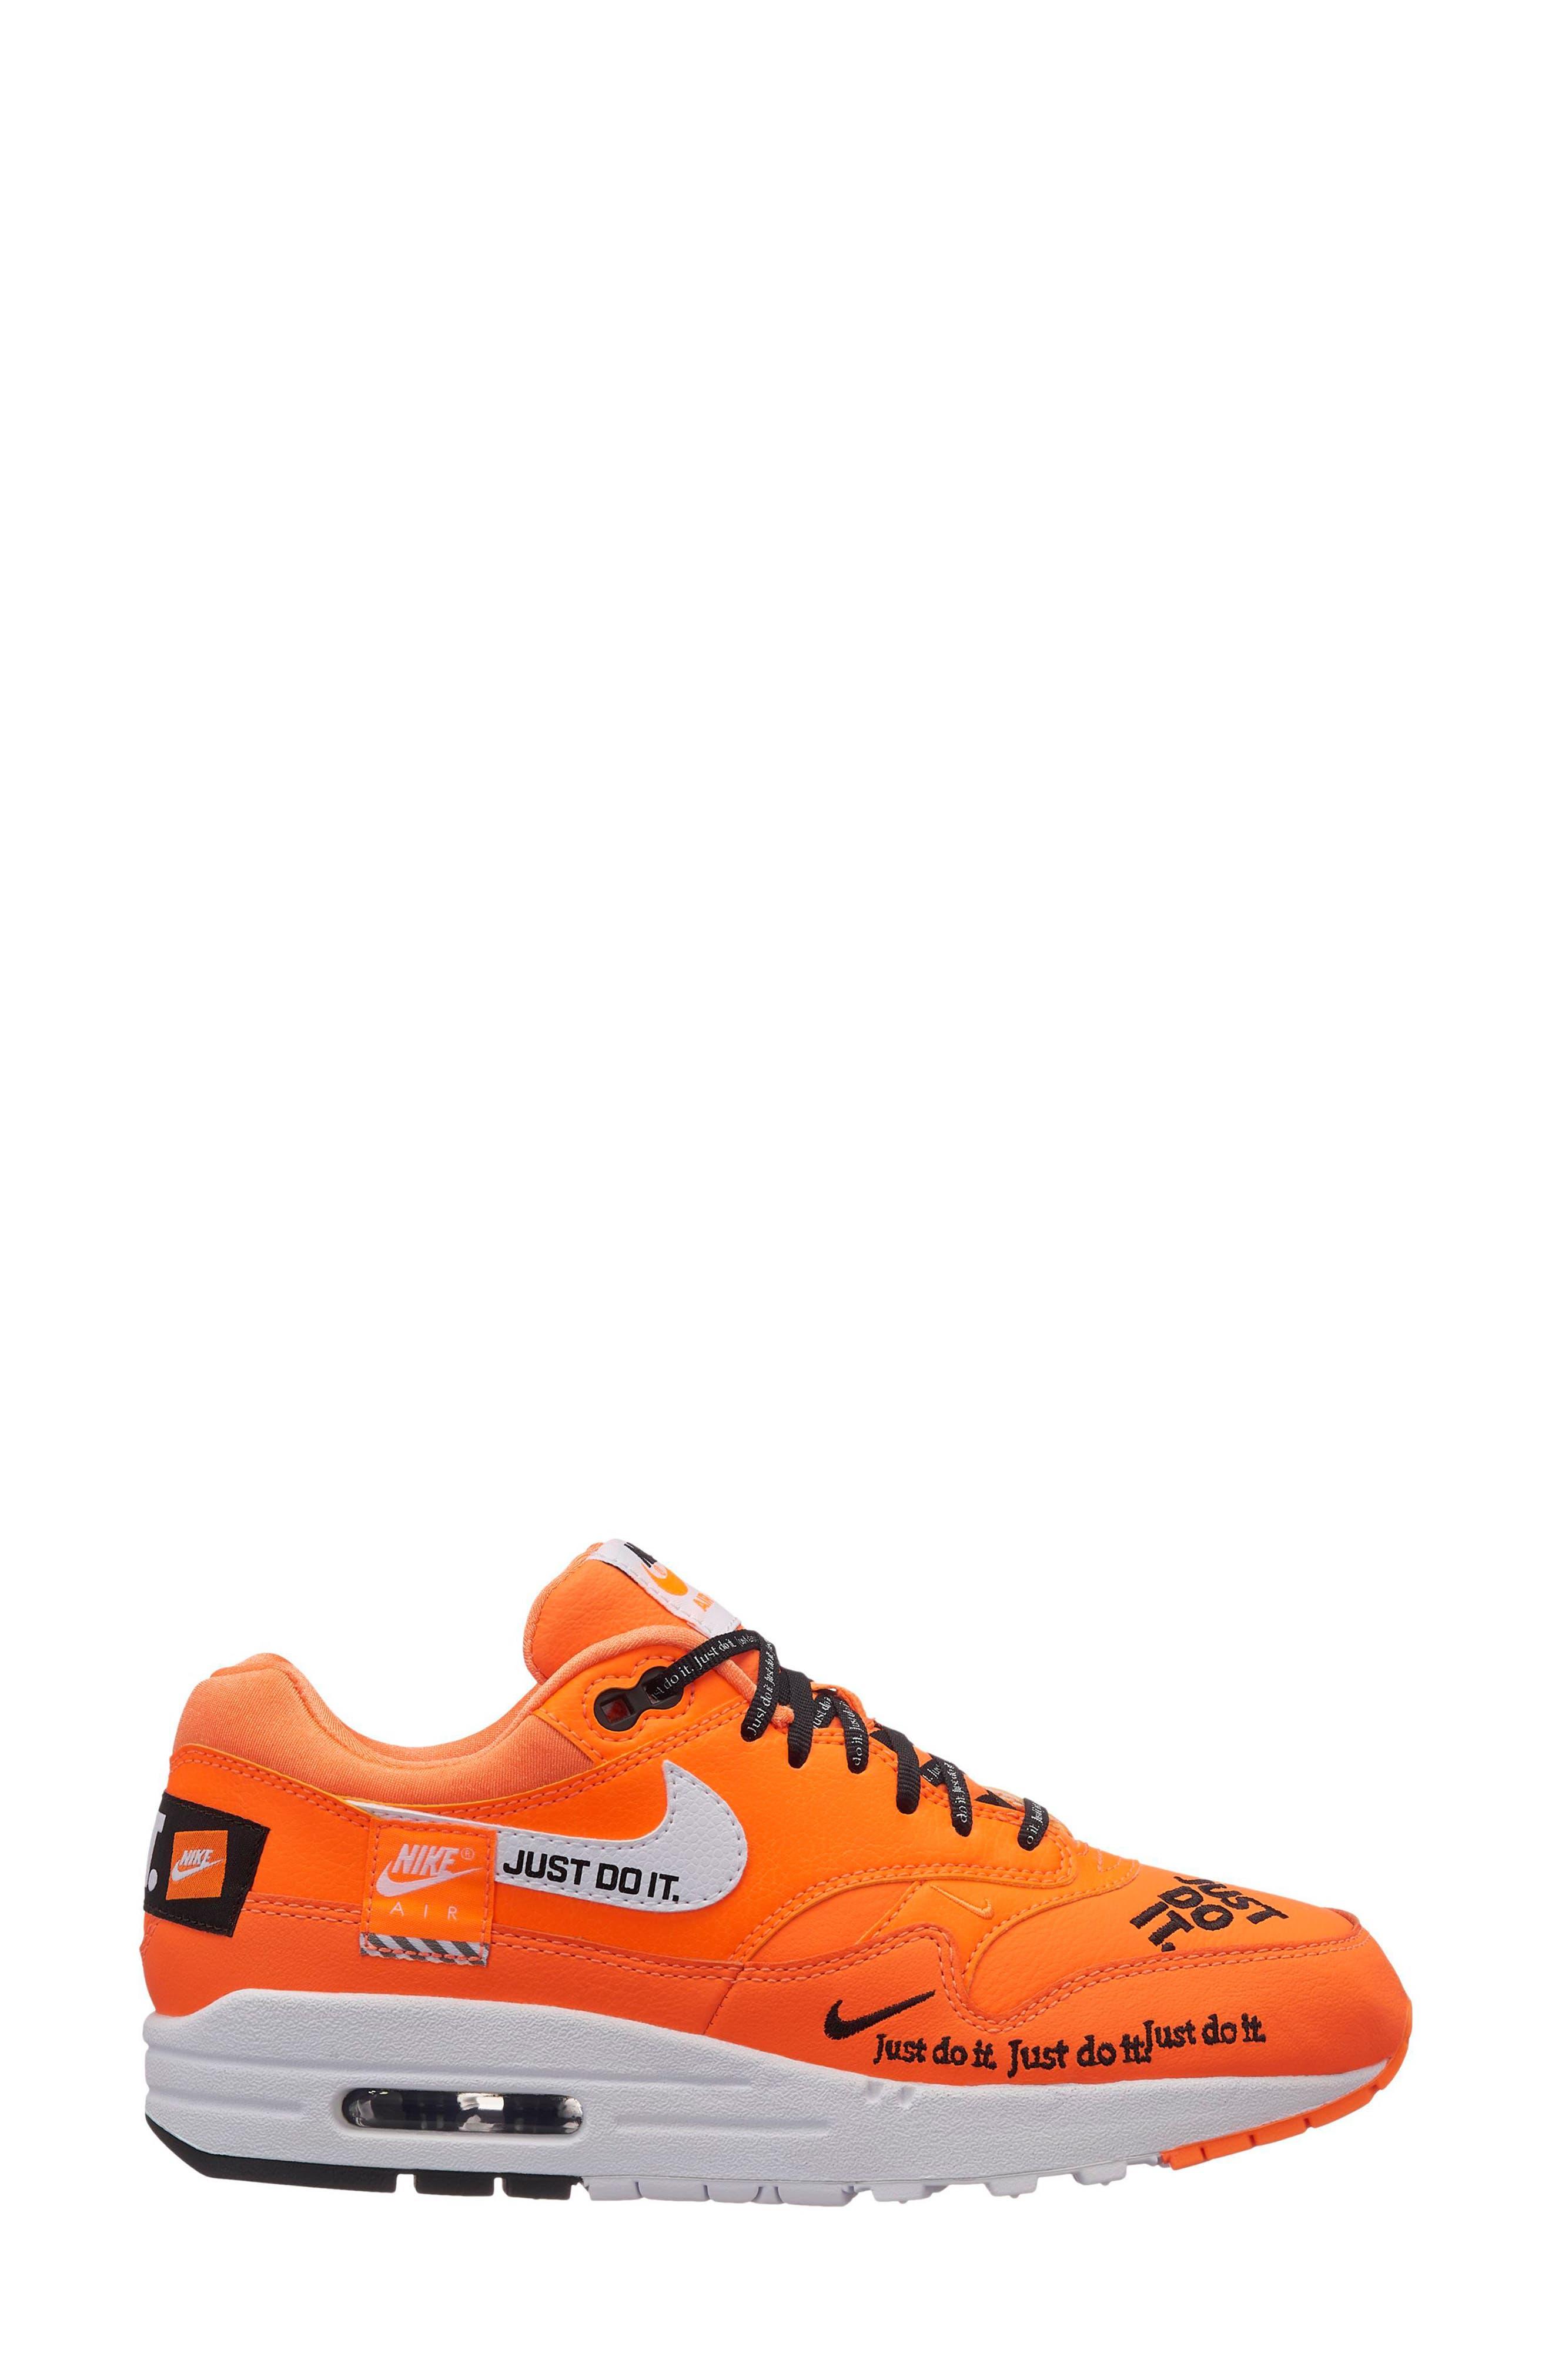 Air Max 1 Lux Sneaker,                             Main thumbnail 1, color,                             Total Orange/ White-Black